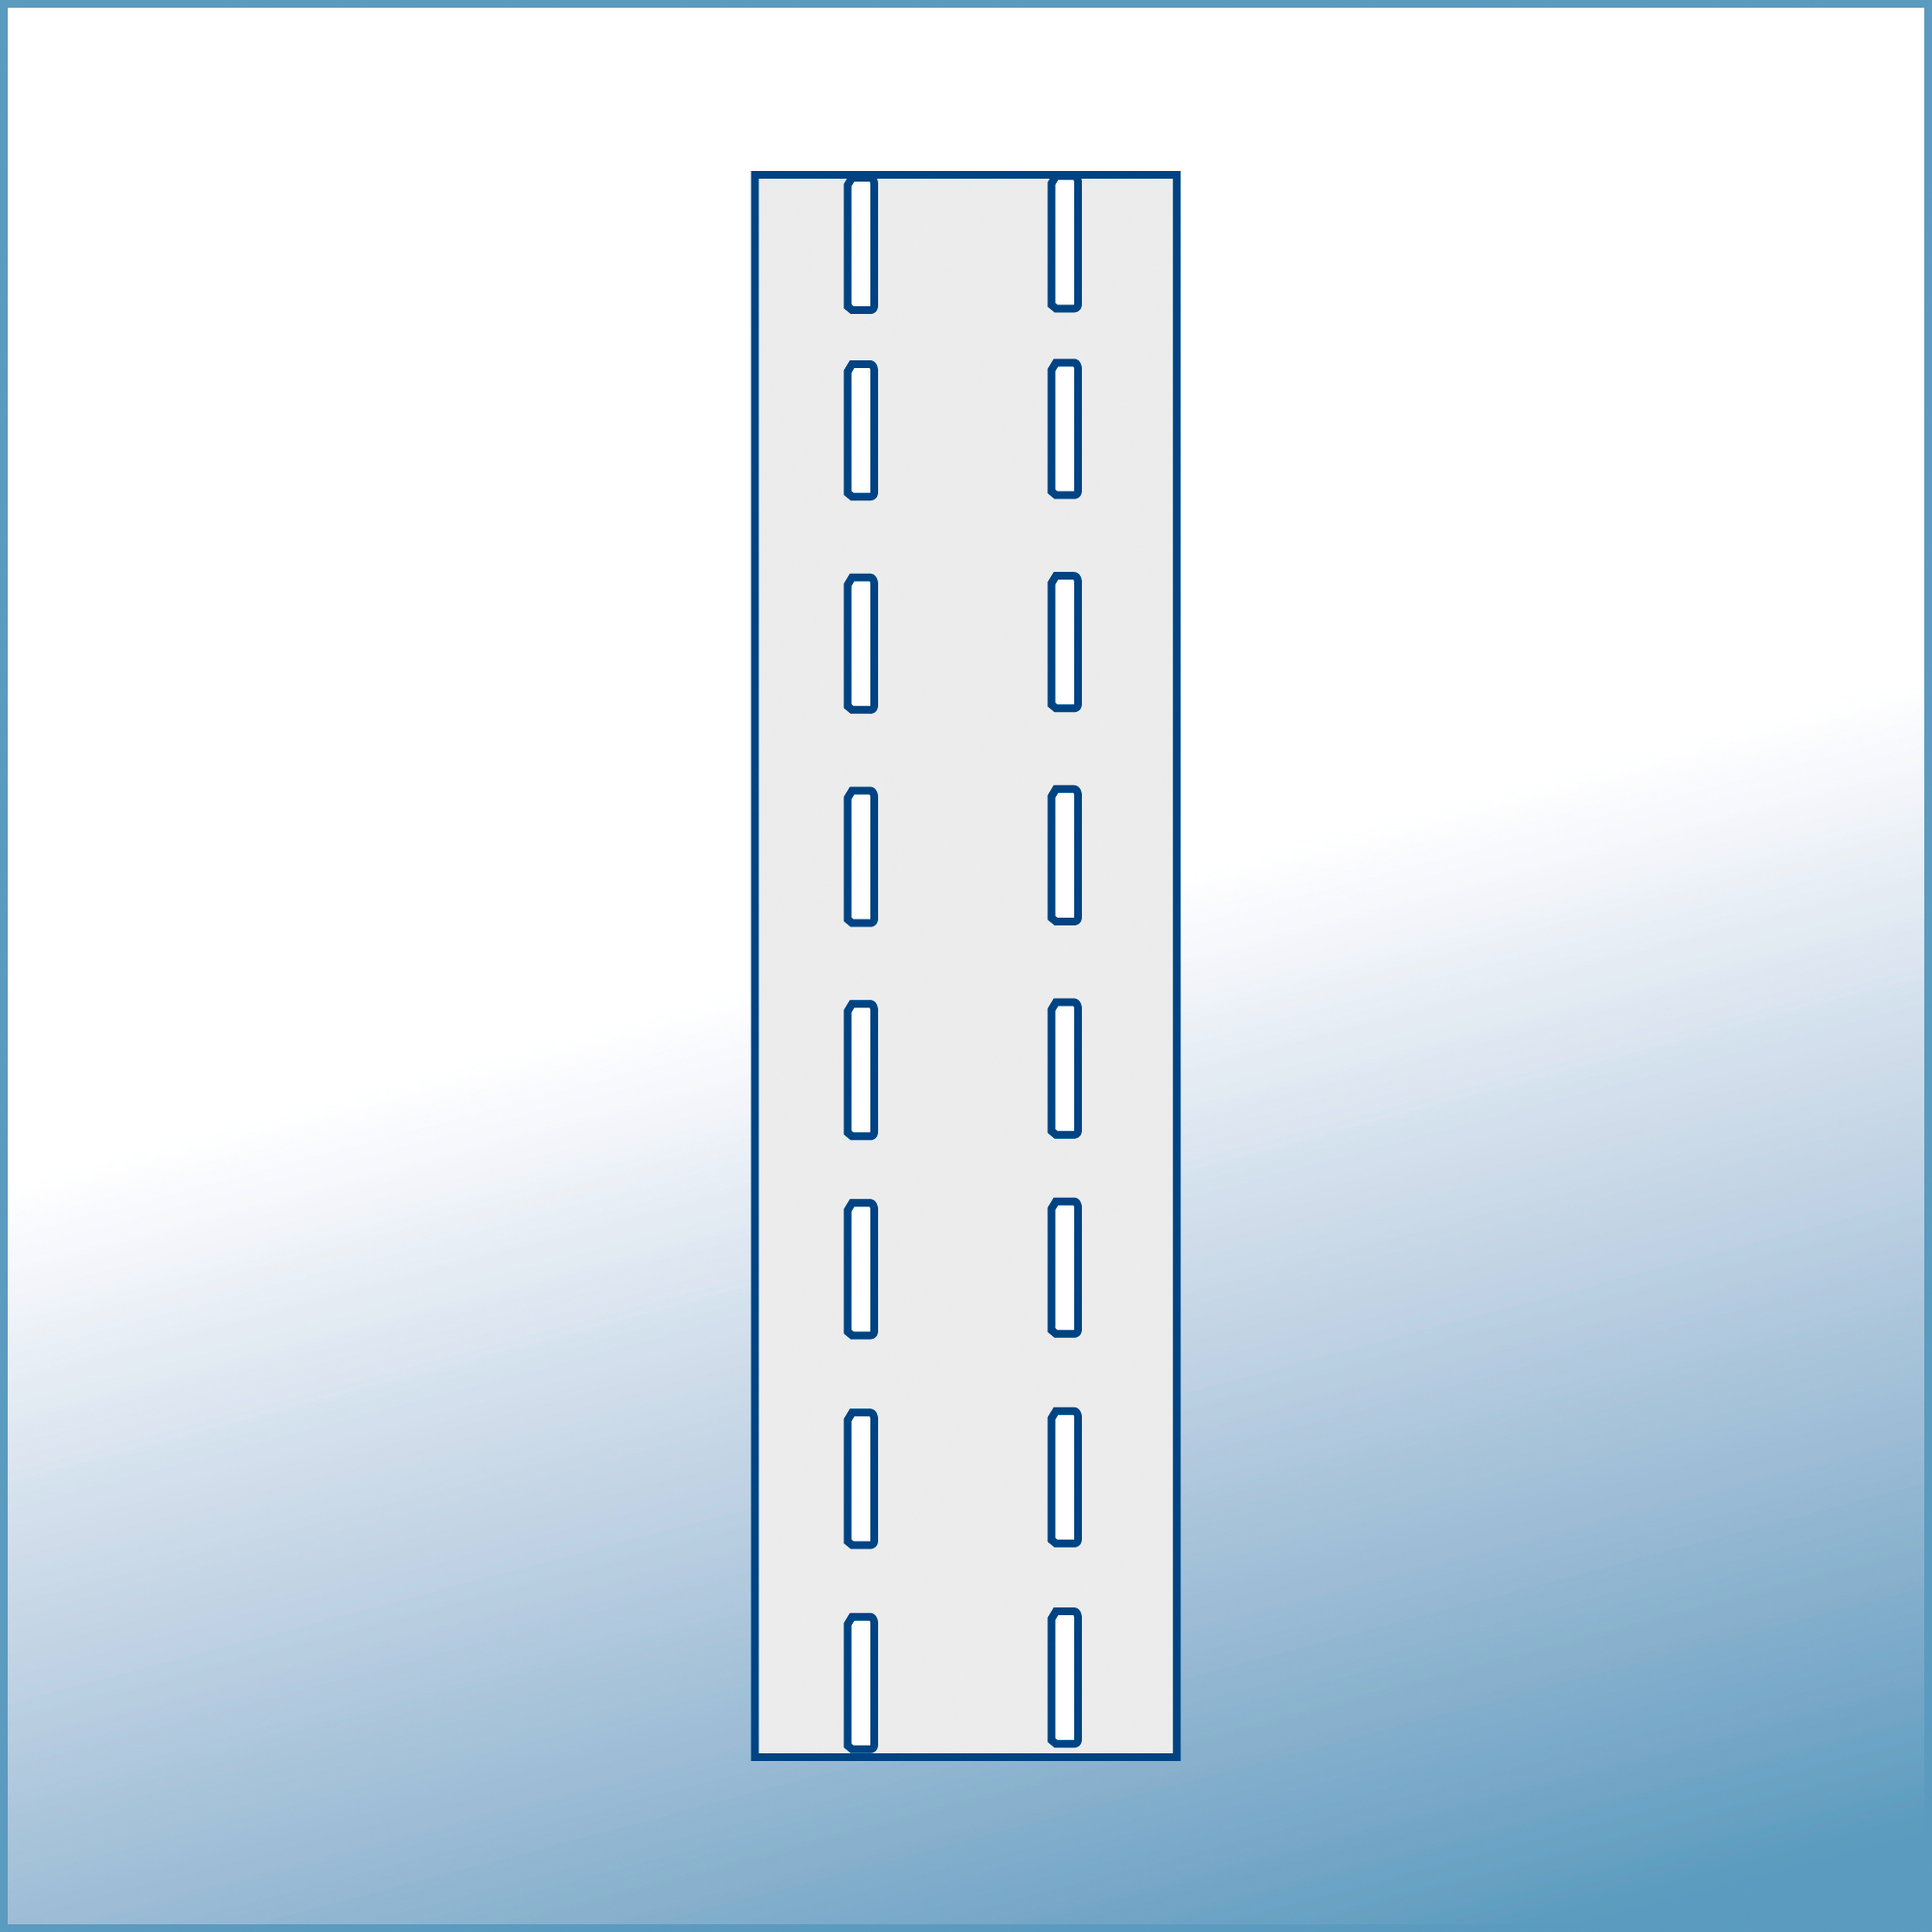 2470 MC1 | PERFORATED TAPE | Black | 100 mm